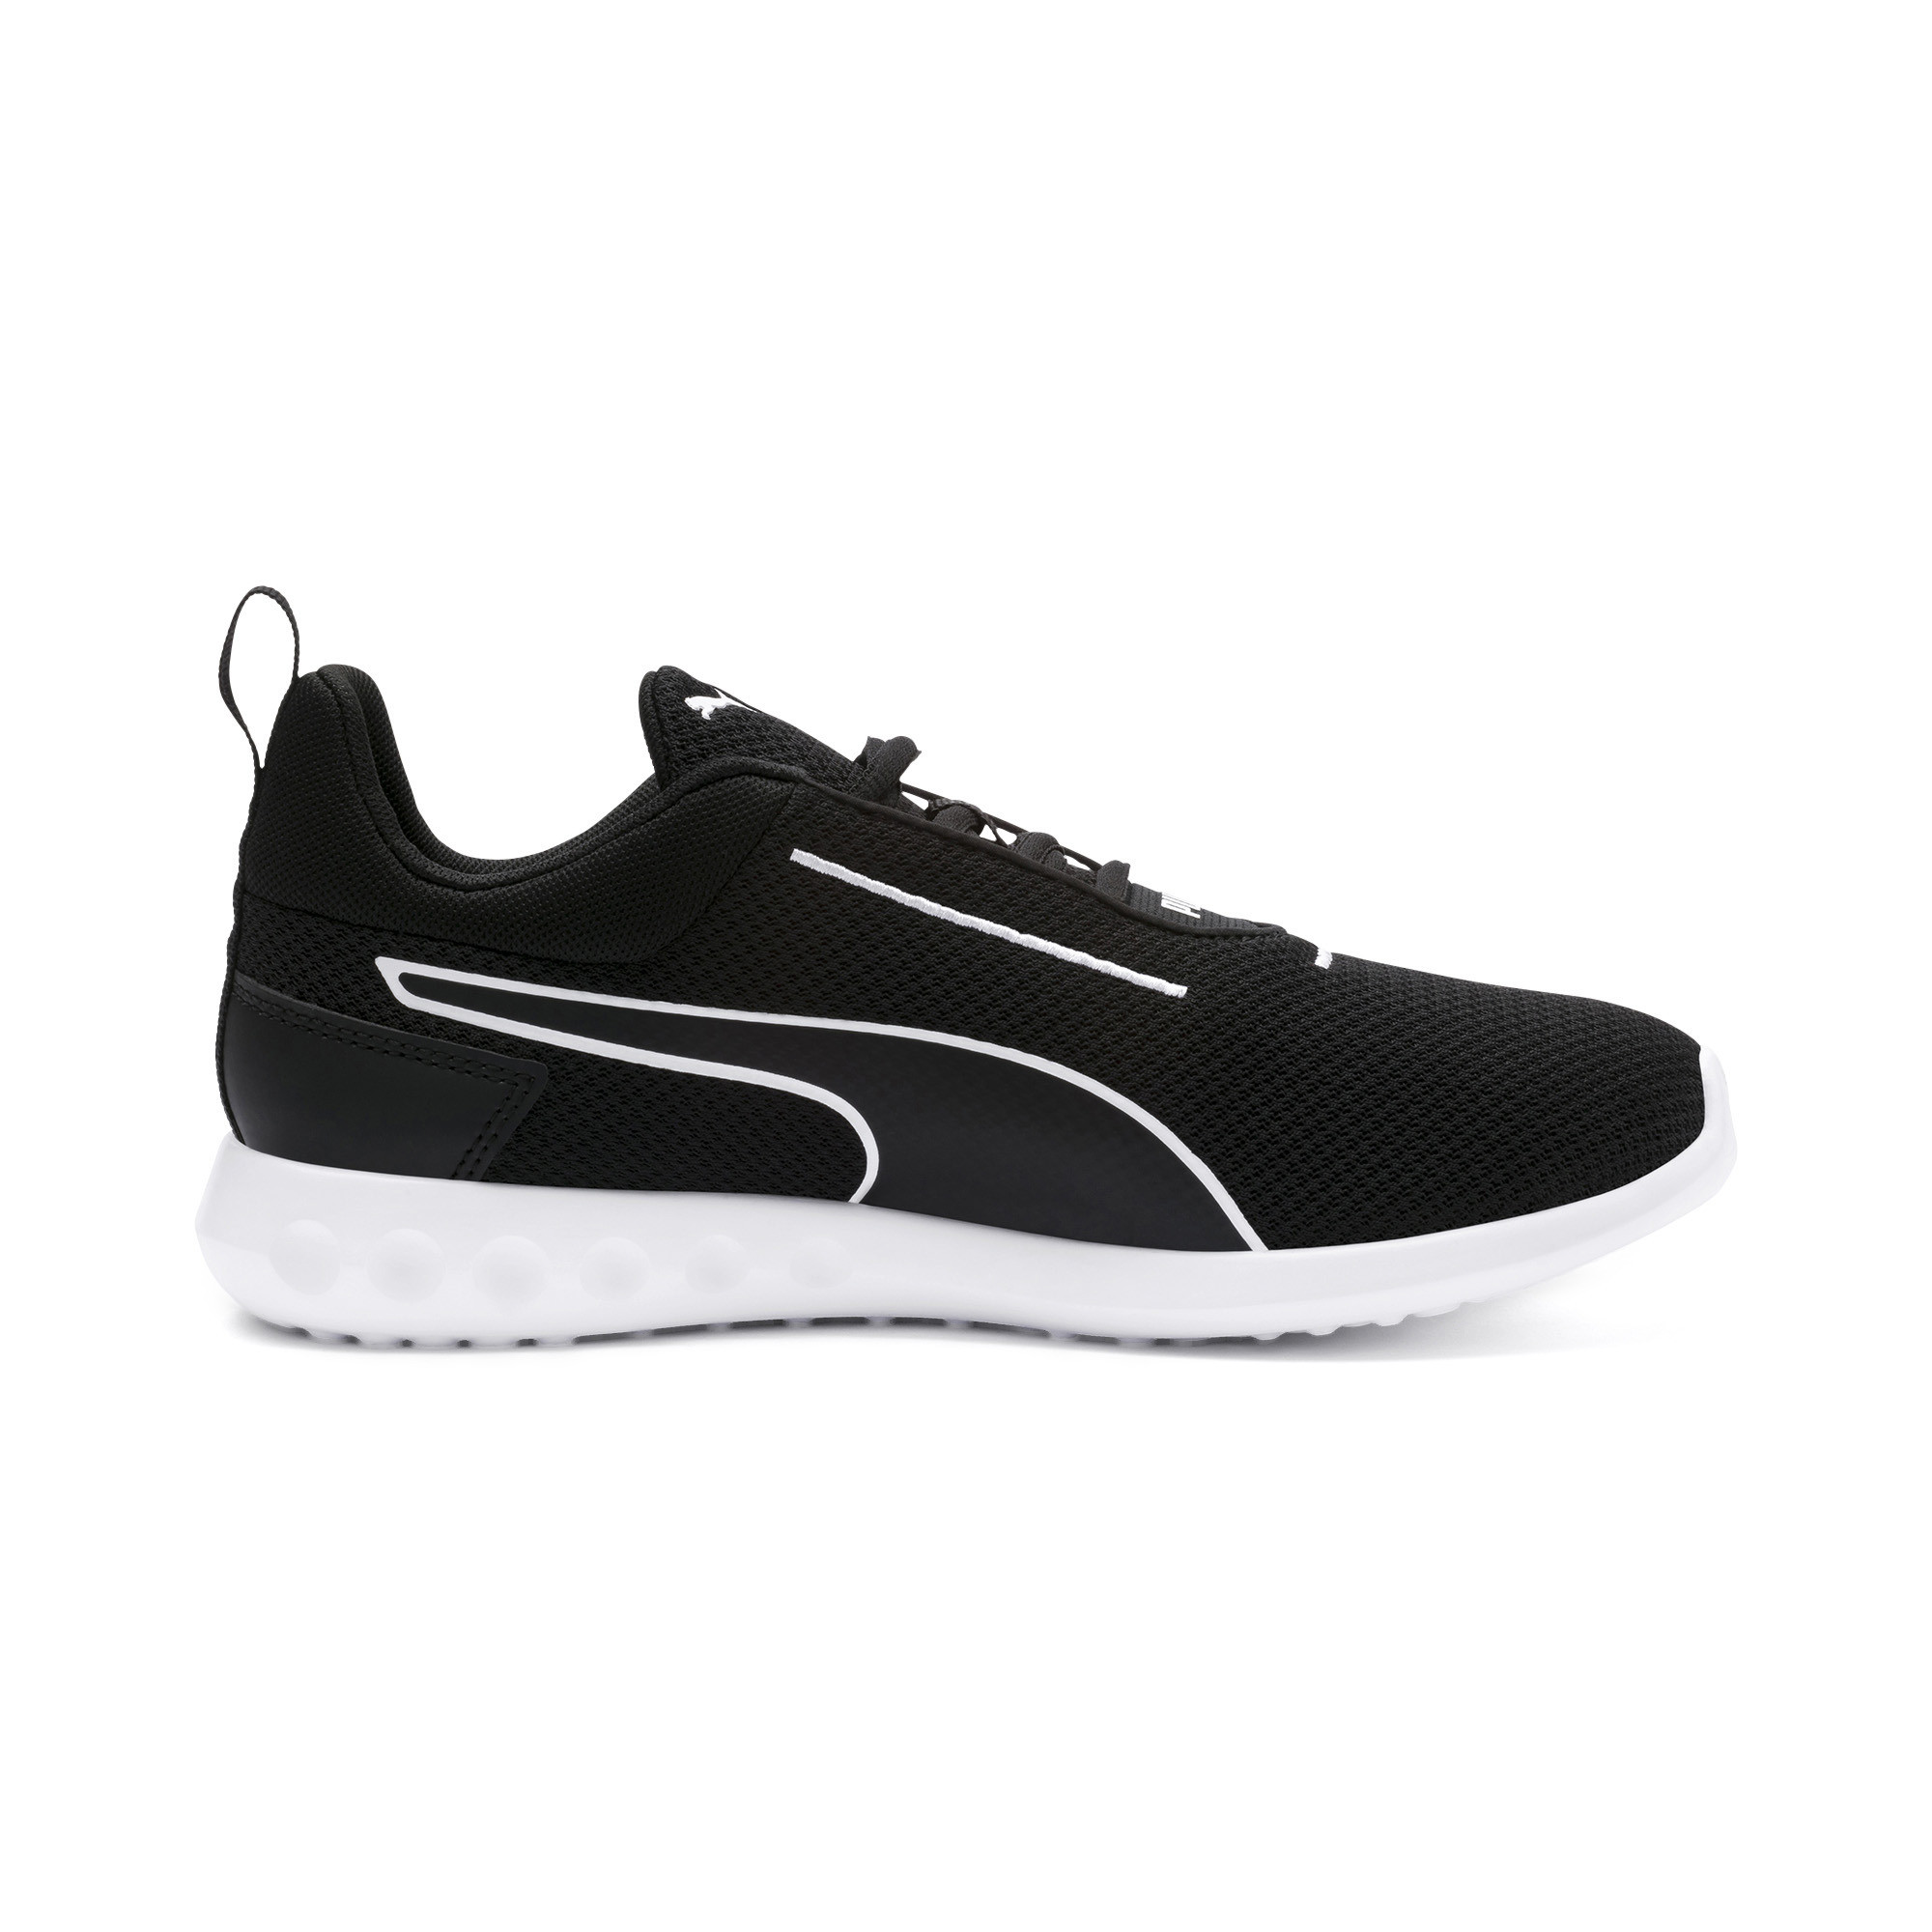 PUMA-Carson-2-Concave-Women-s-Training-Shoes-Women-Shoe-Running thumbnail 18